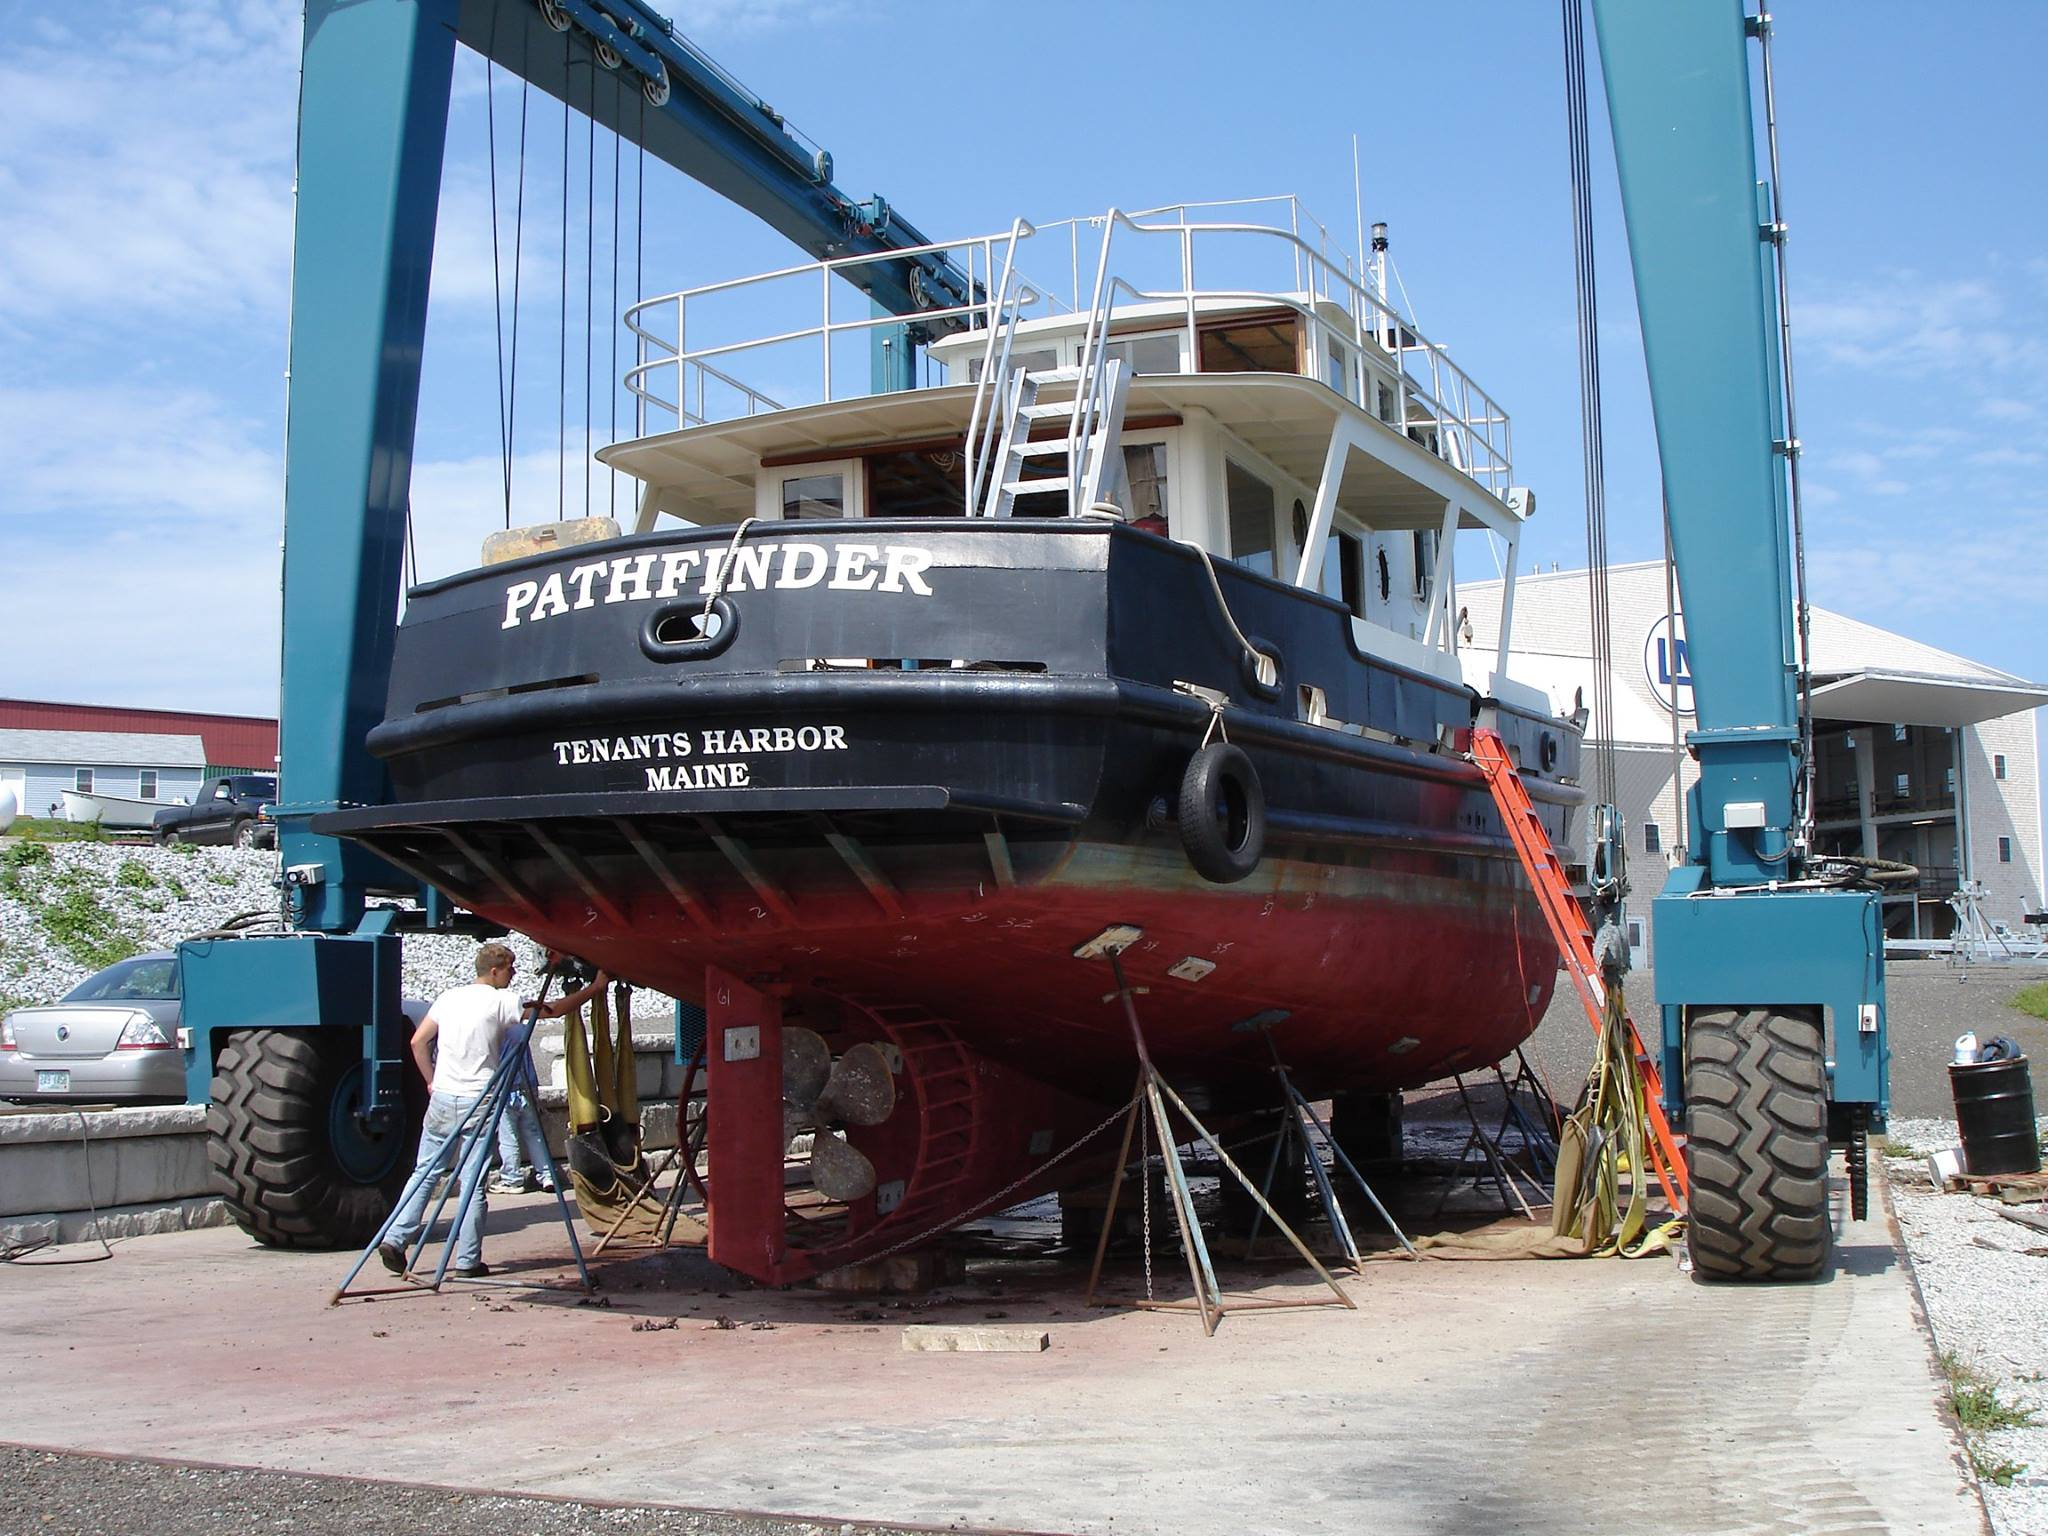 Midcoast Yacht & Ship Brokerage - Downeast Lobster Boats